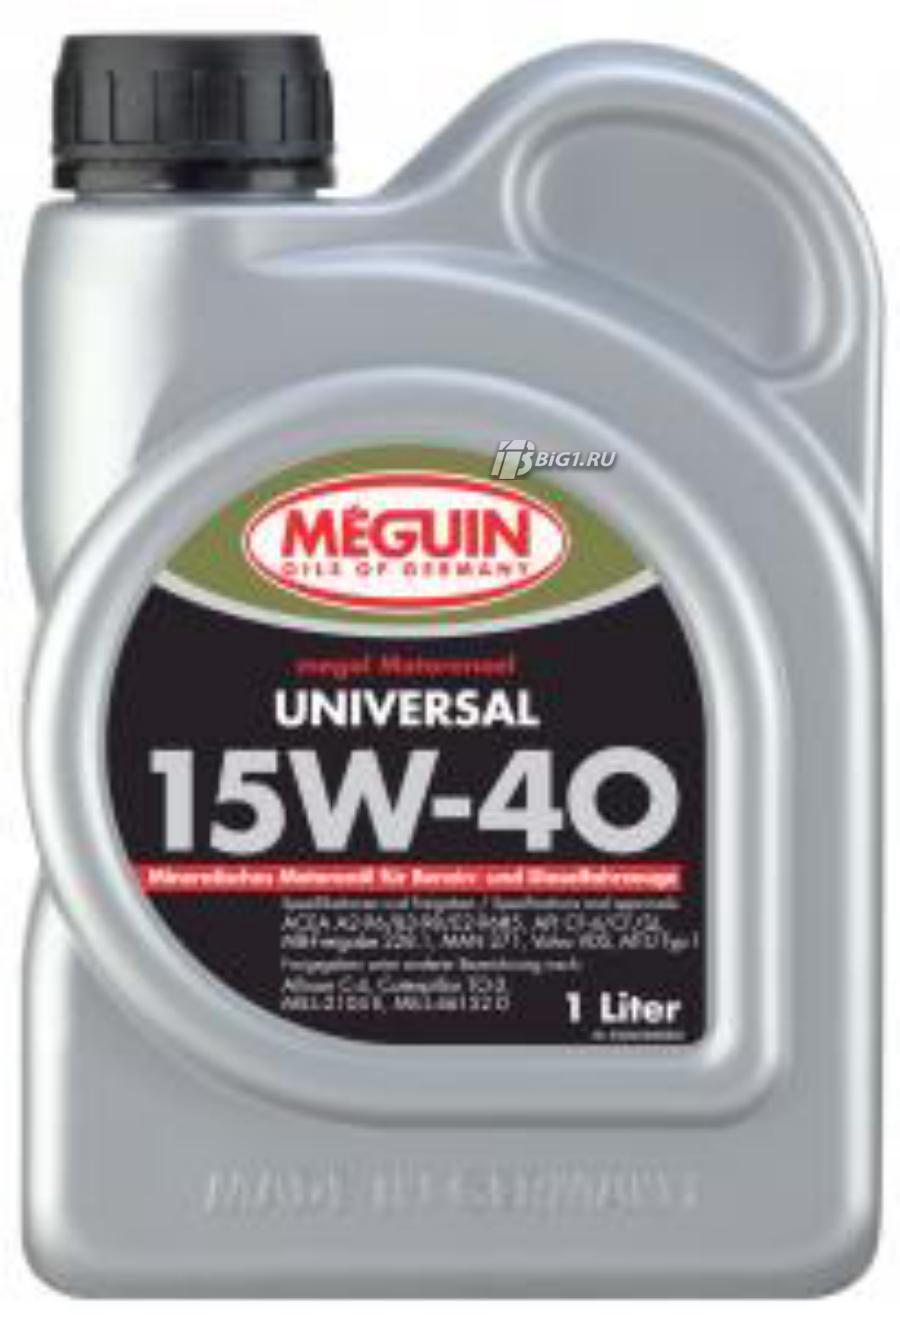 MEGUIN Motorenoel Universal SAE 15W-40